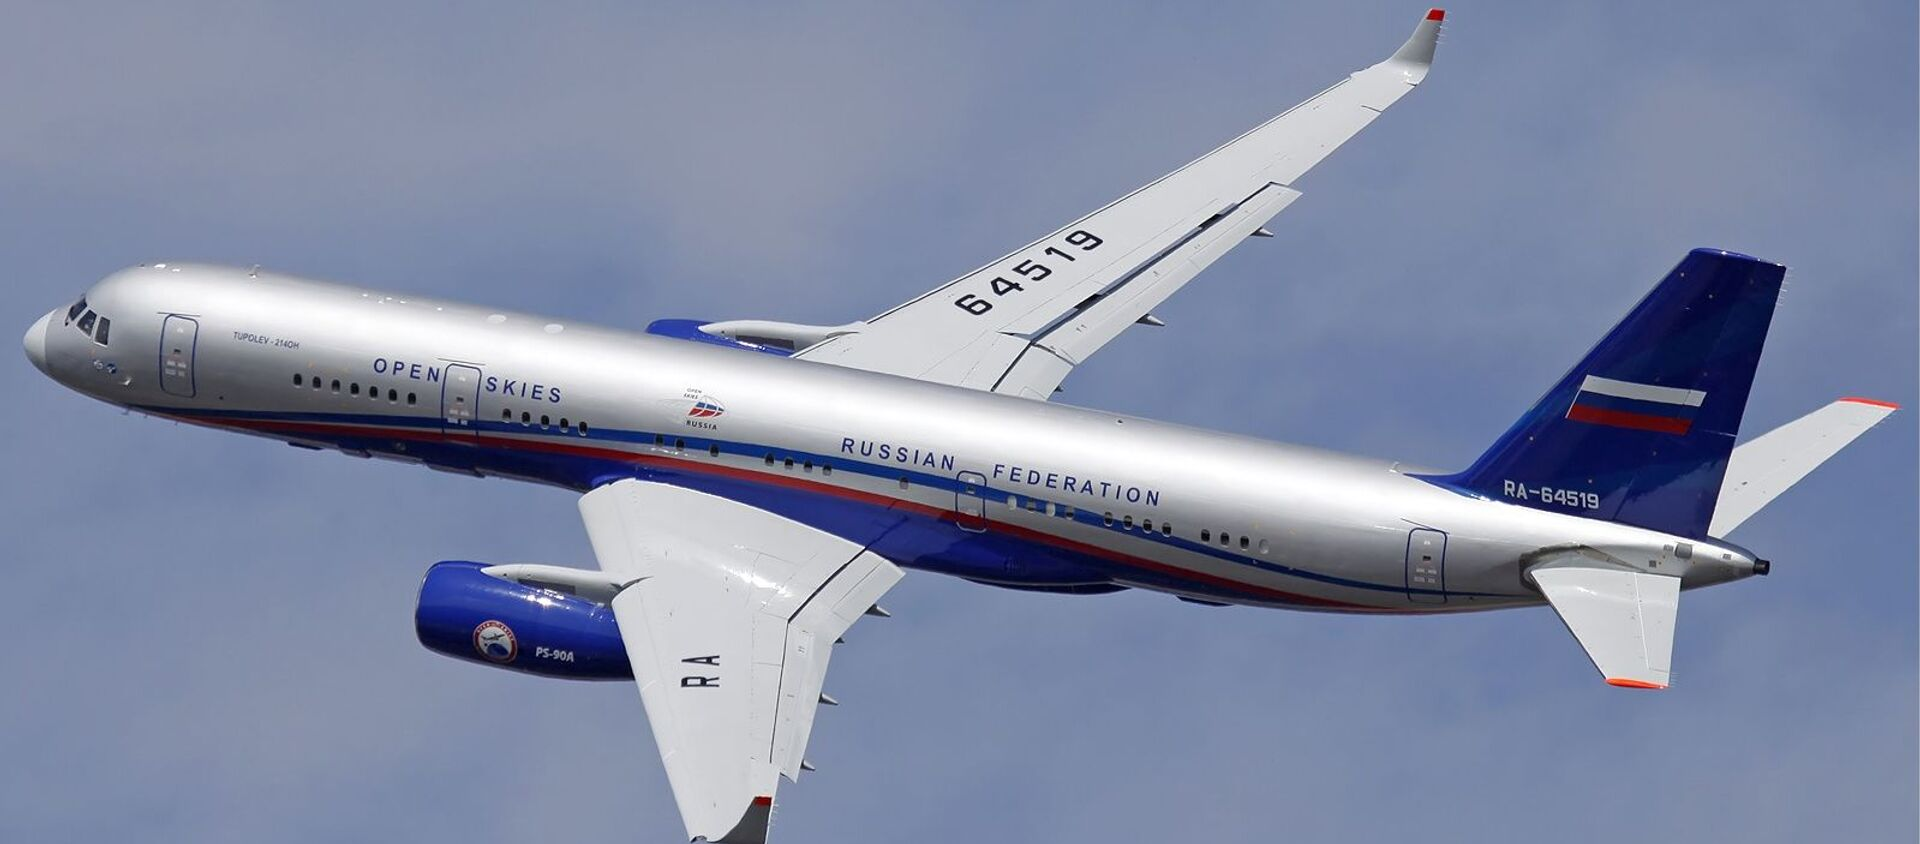 Samolot nadzoru lotniczego Tu-214ON - Sputnik Polska, 1920, 06.04.2021